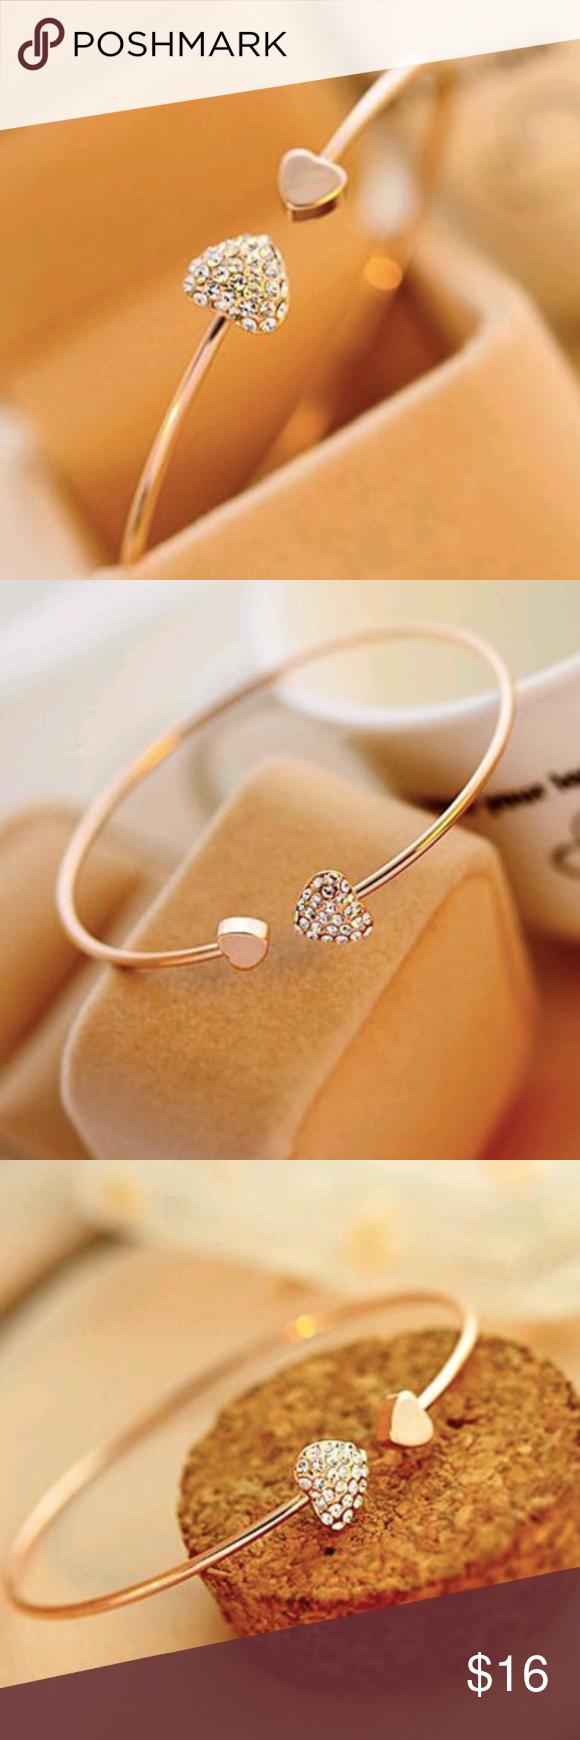 Heart bracelet gold color crystal love opening brand namelaq